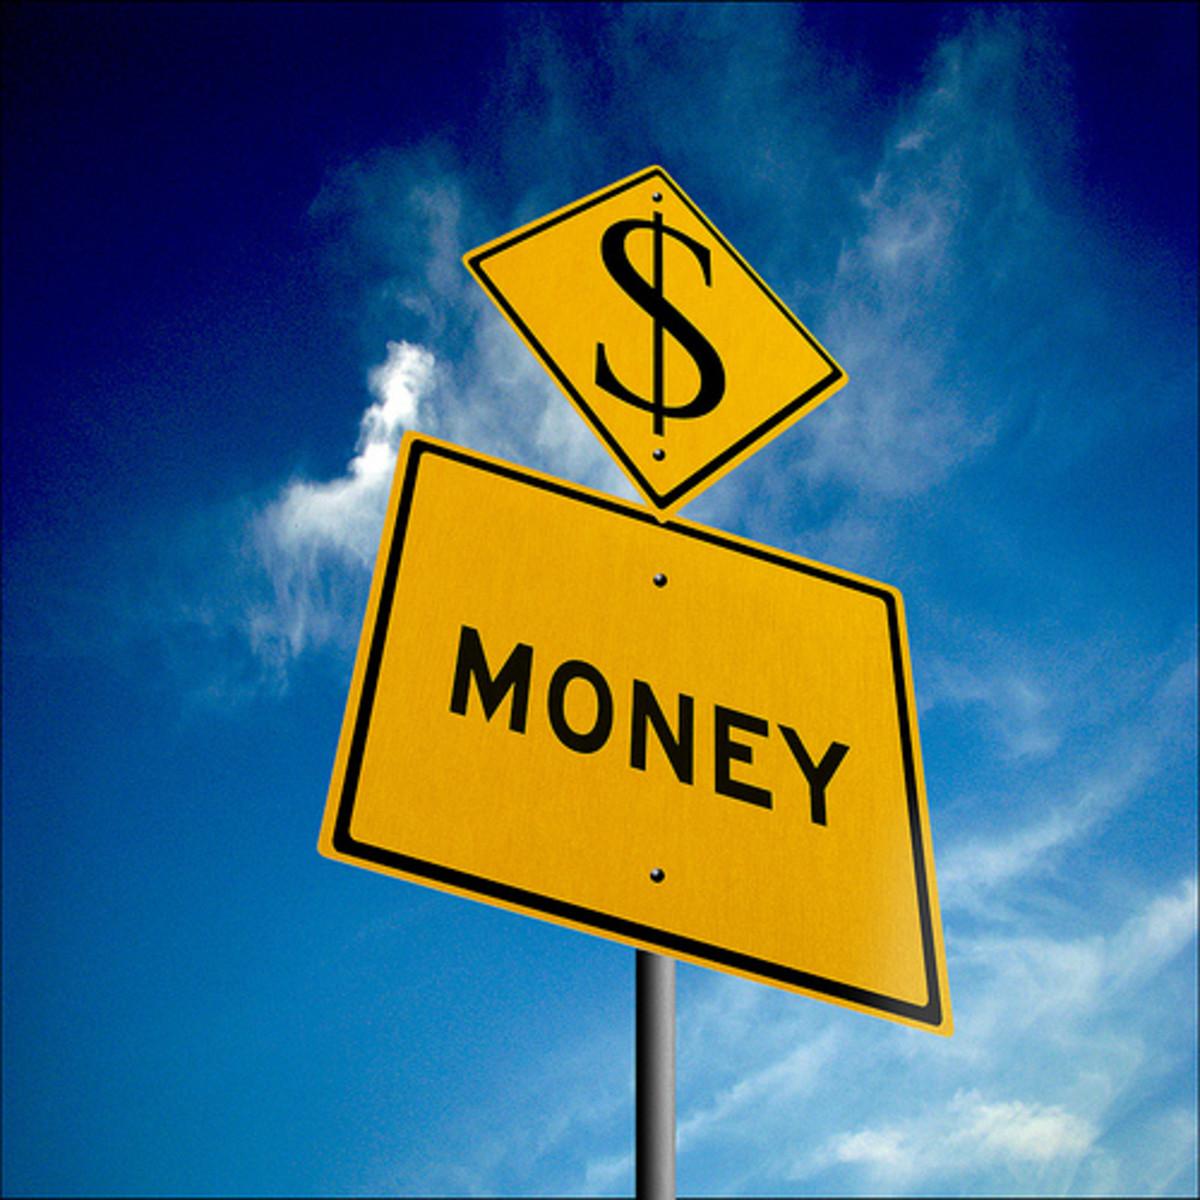 Money sign against sky